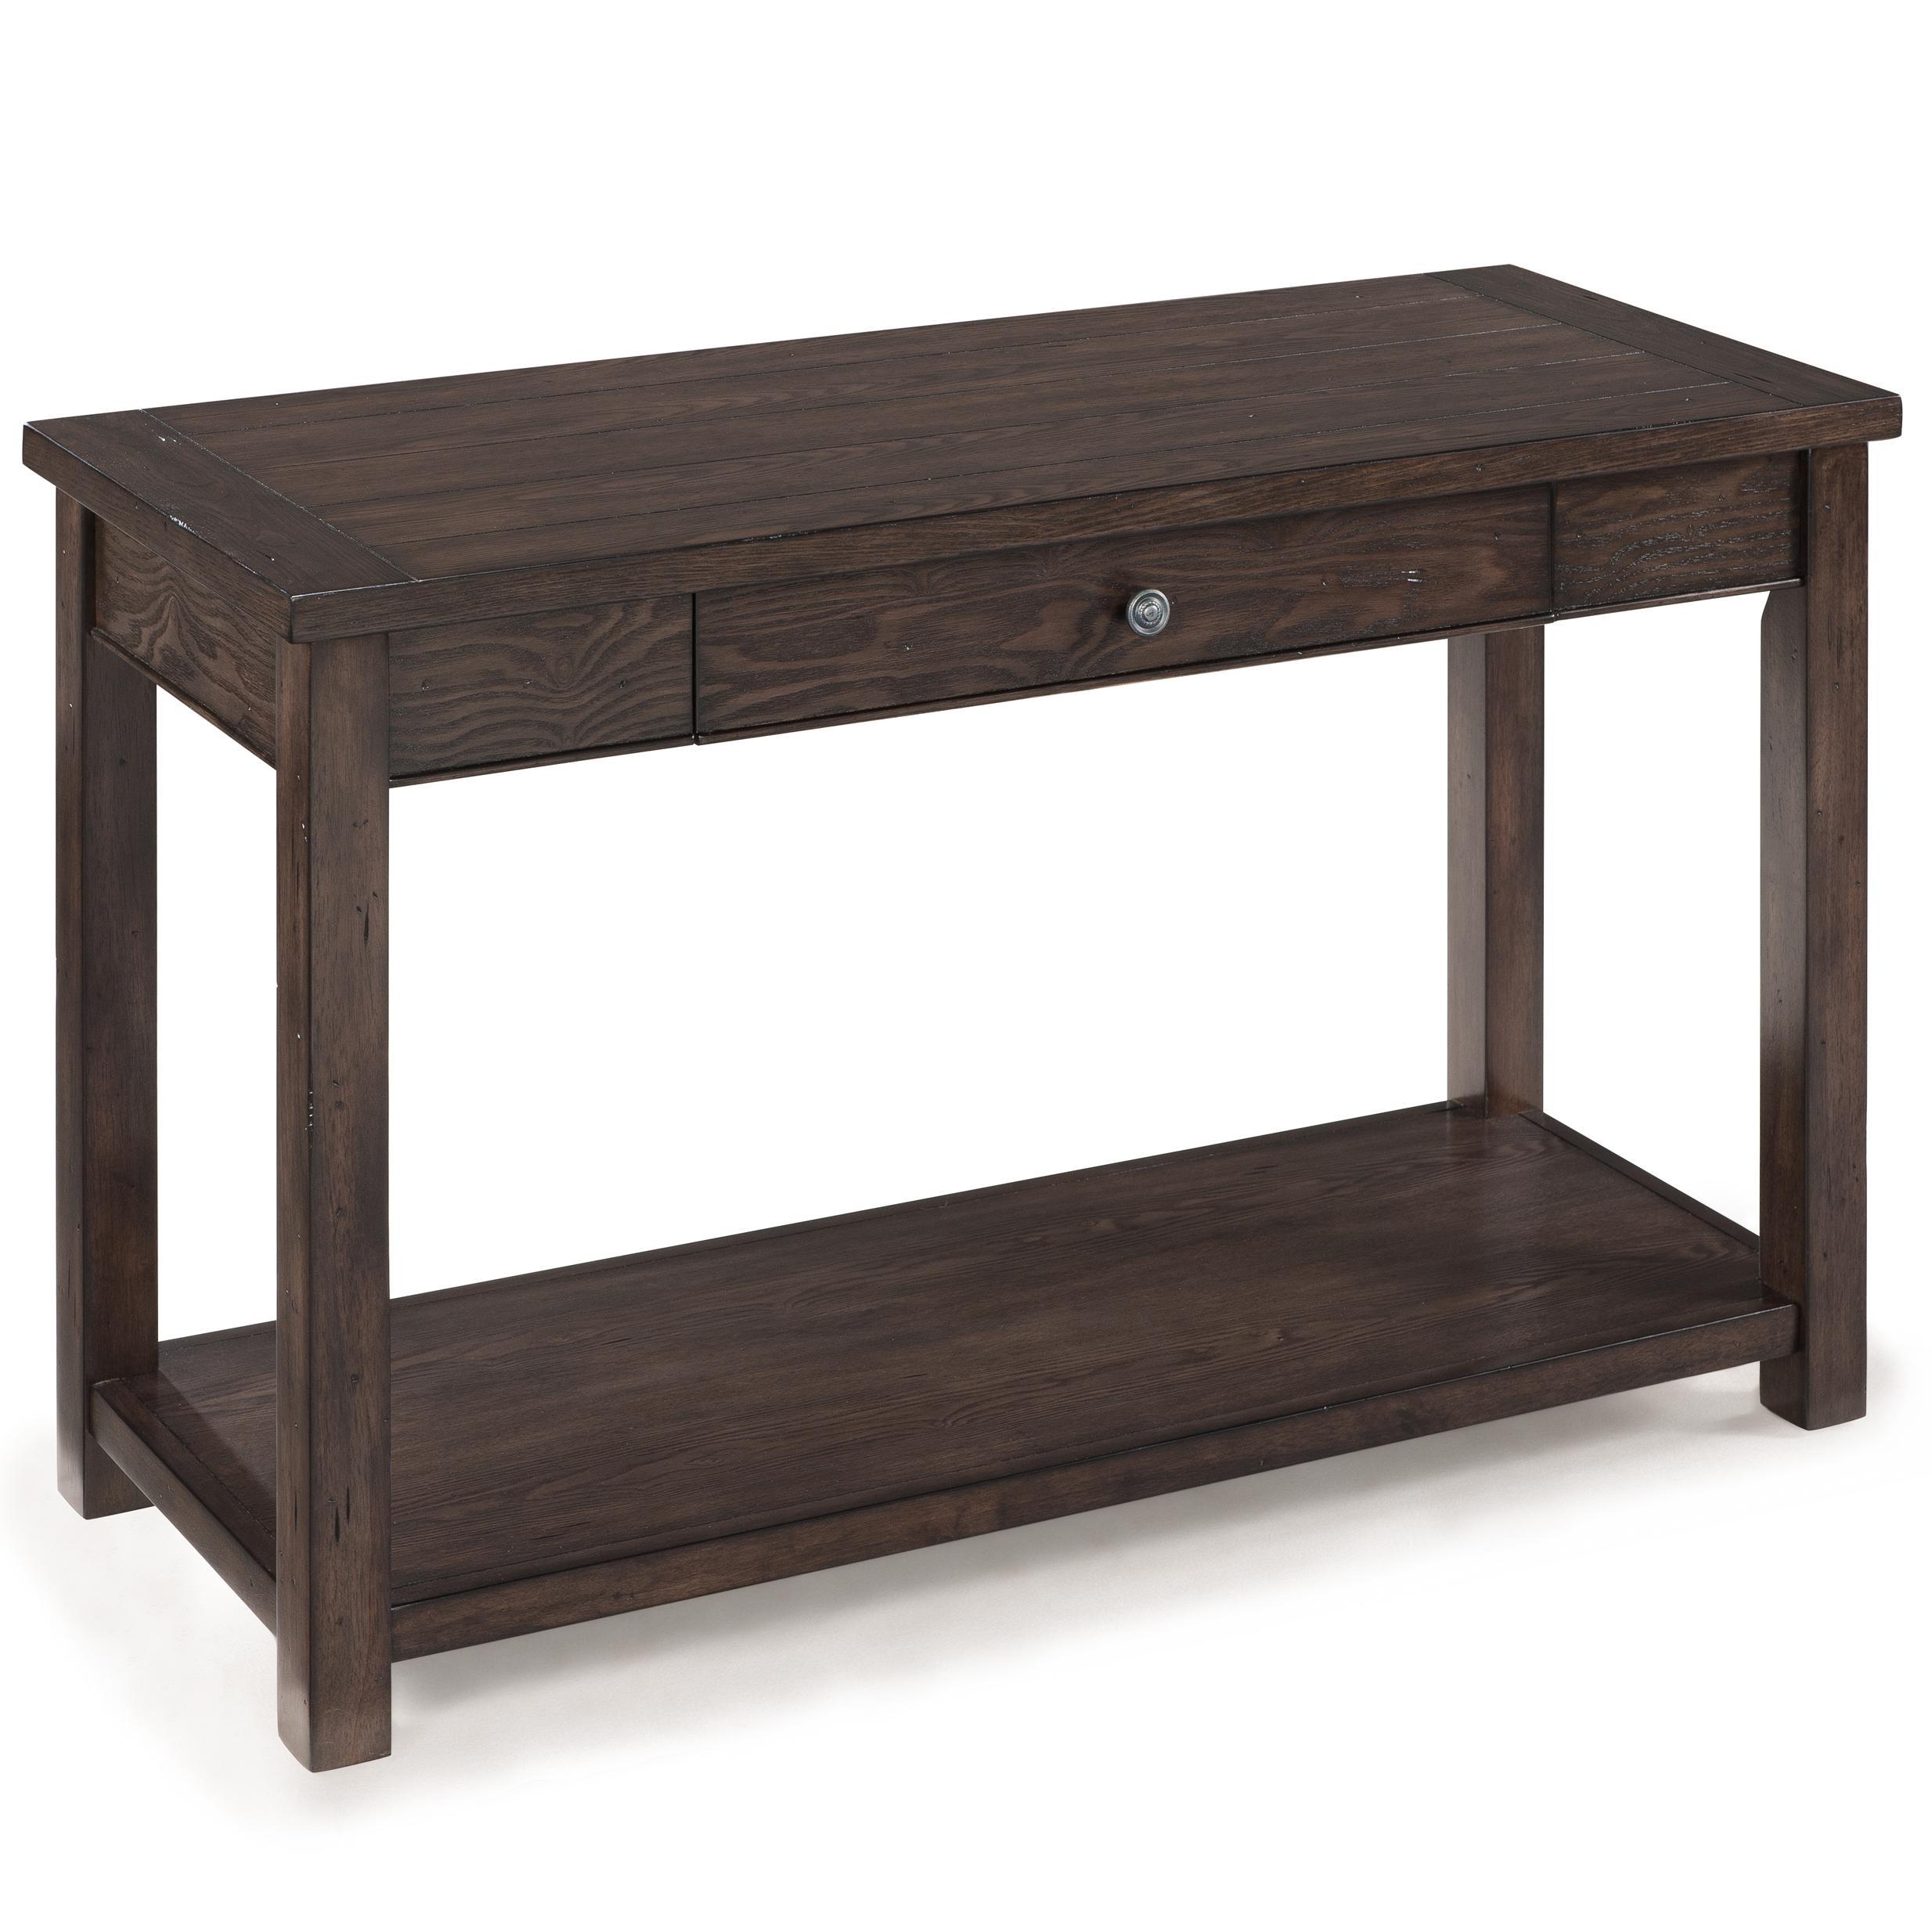 Magnussen Home Clayton Rectangular Sofa Table - Item Number: T2741-73